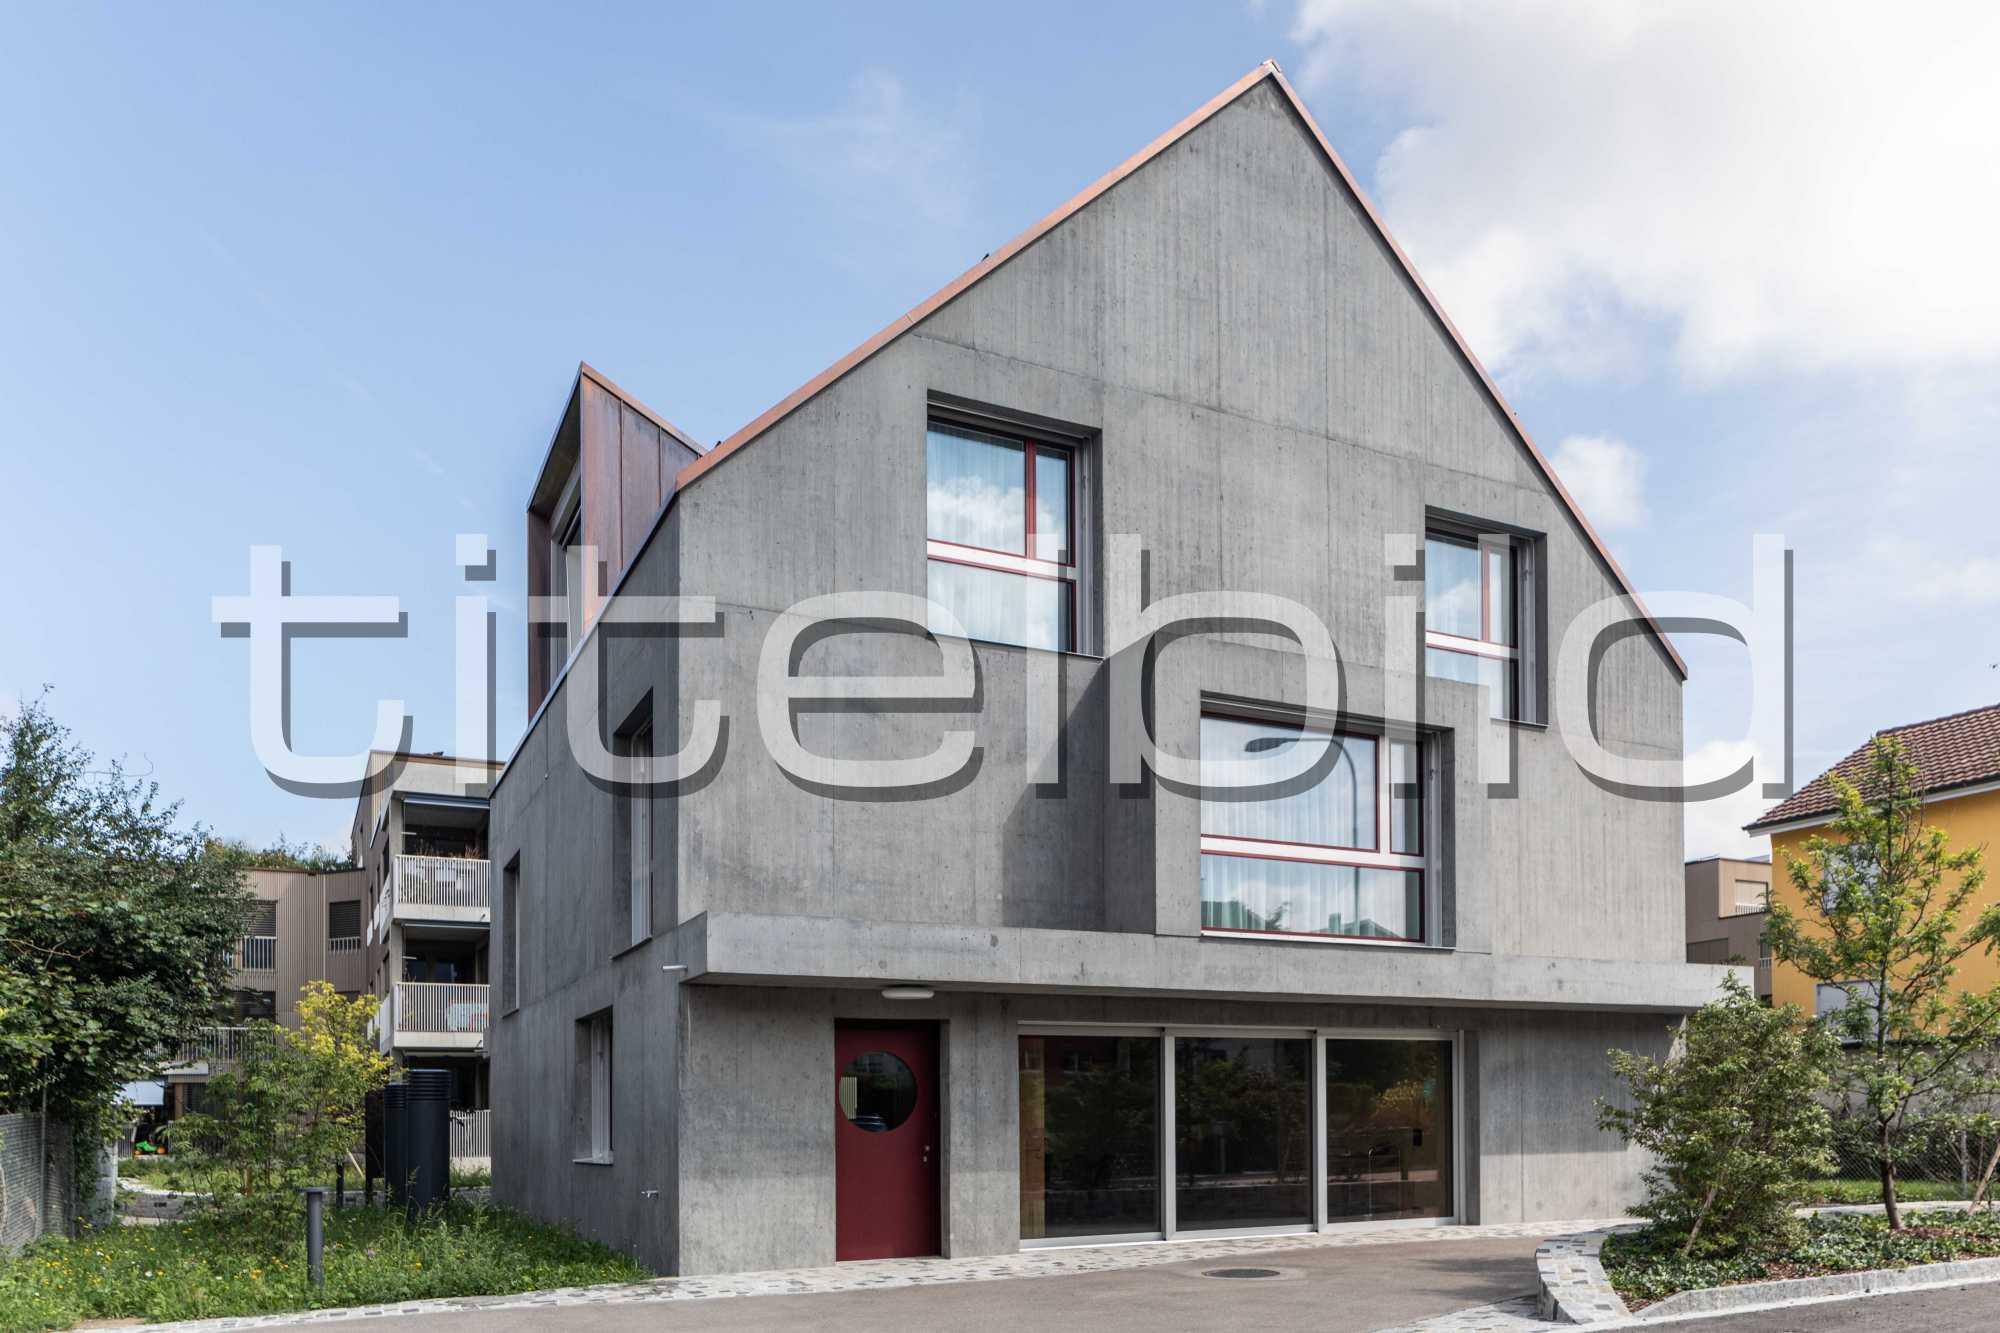 Projektbild-Nr. 4: Neubau Siedlung Riedgraben (Siedlungslokal)